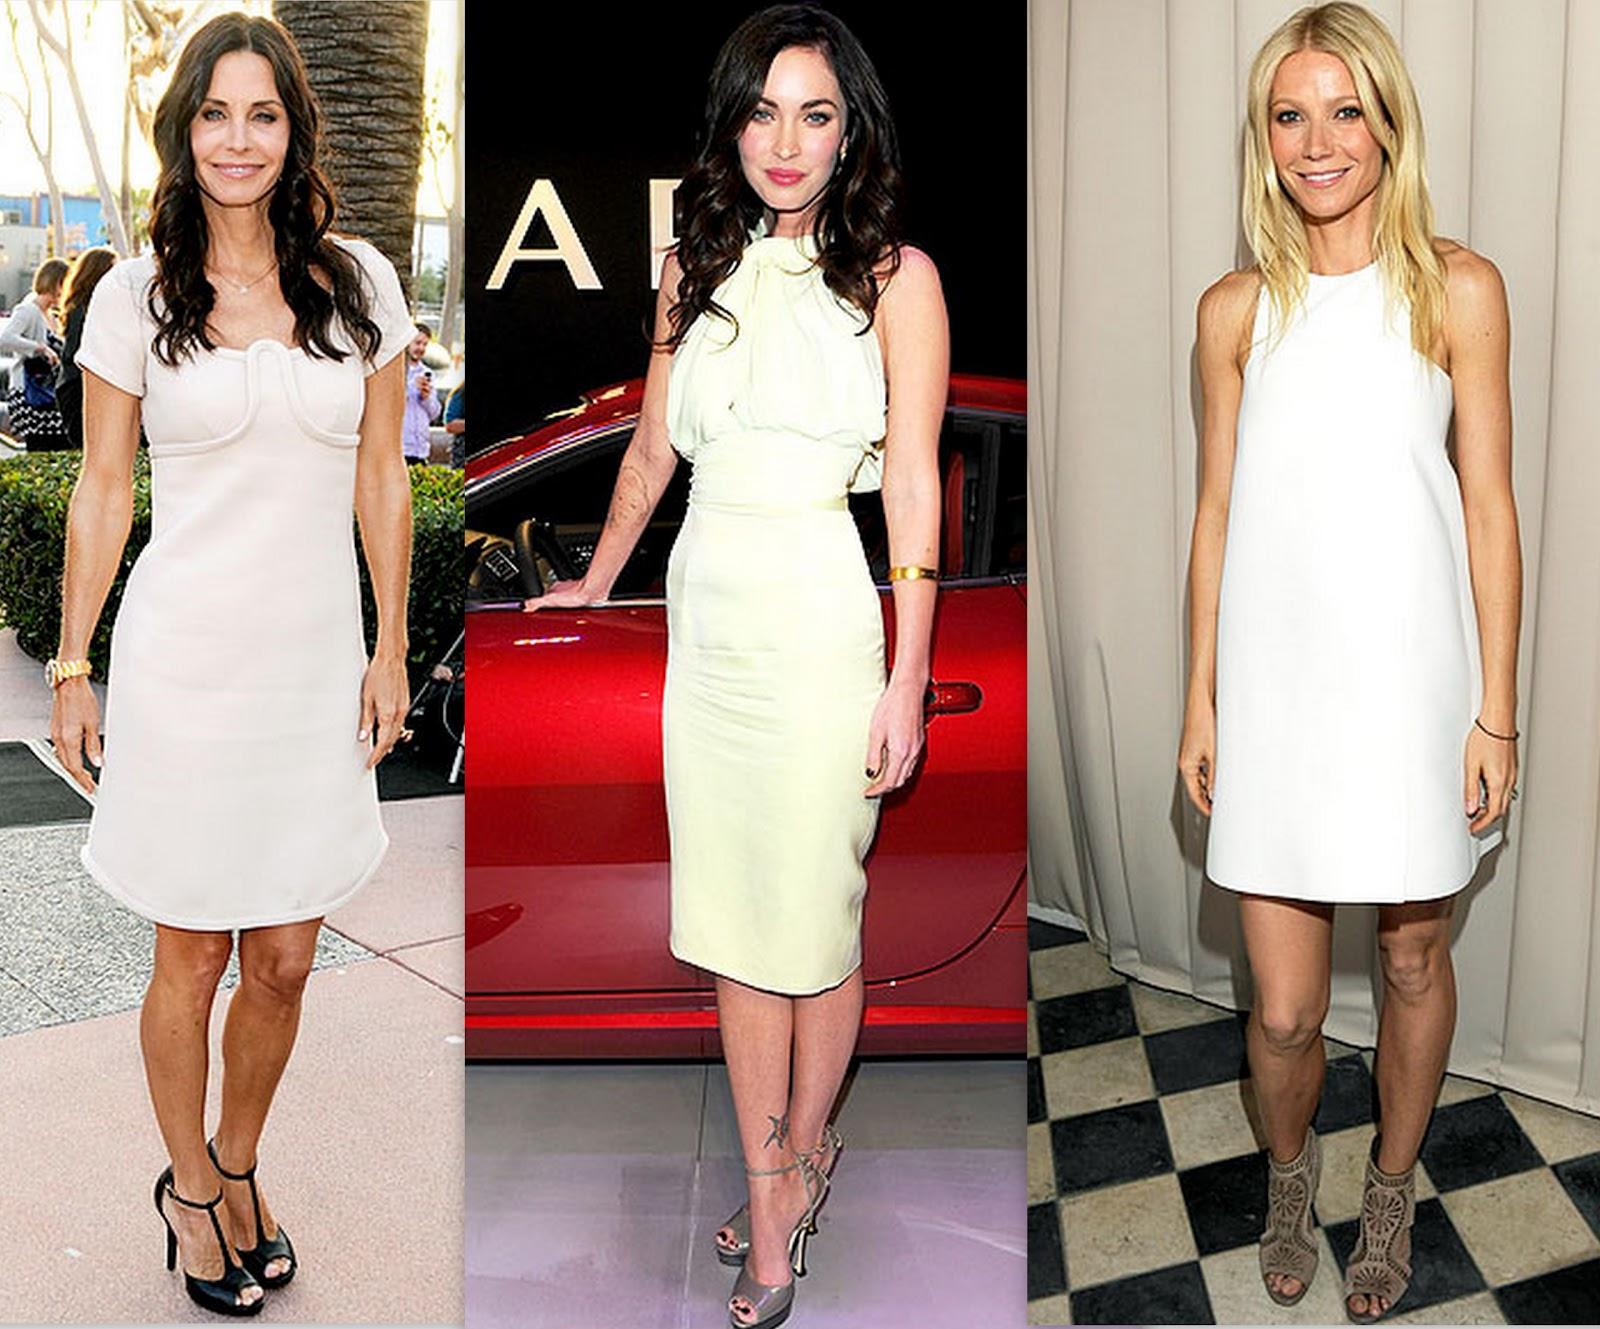 http://1.bp.blogspot.com/-hkDGaKgUtEk/TbD-o8EktgI/AAAAAAAAAdc/wNQbb3QDYtk/s1600/white+dress2.jpg